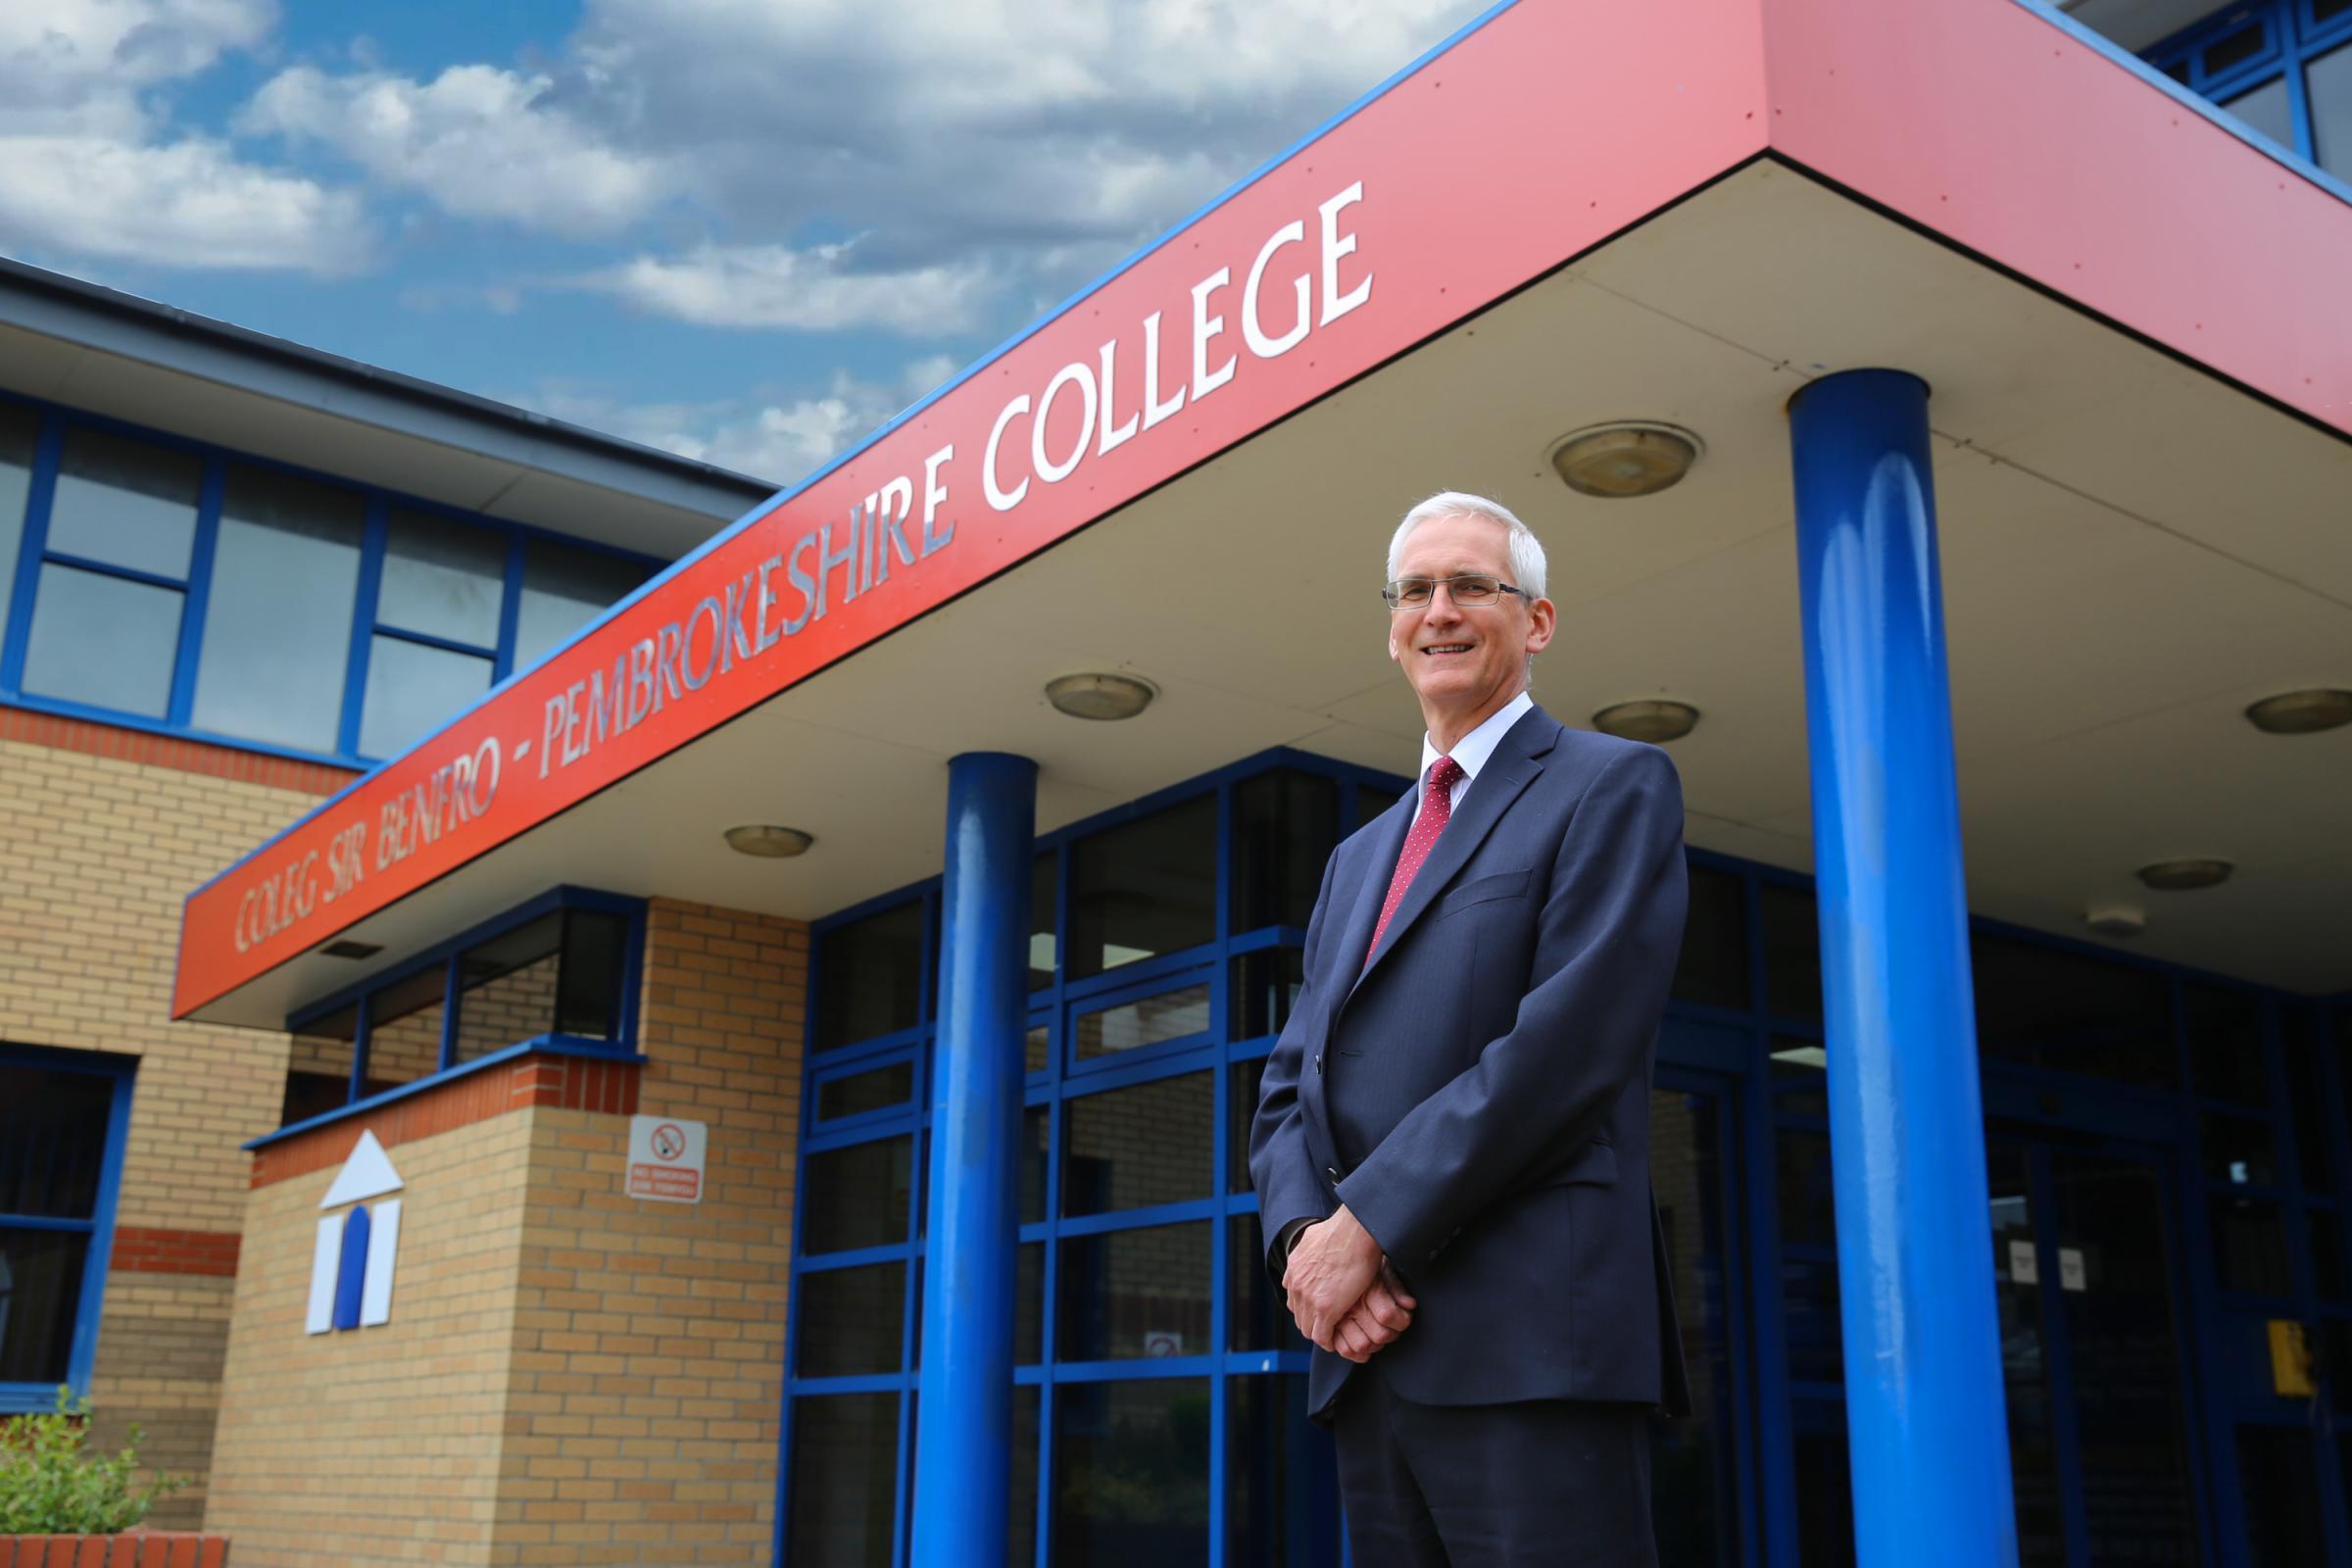 New principal at Pembrokeshire College